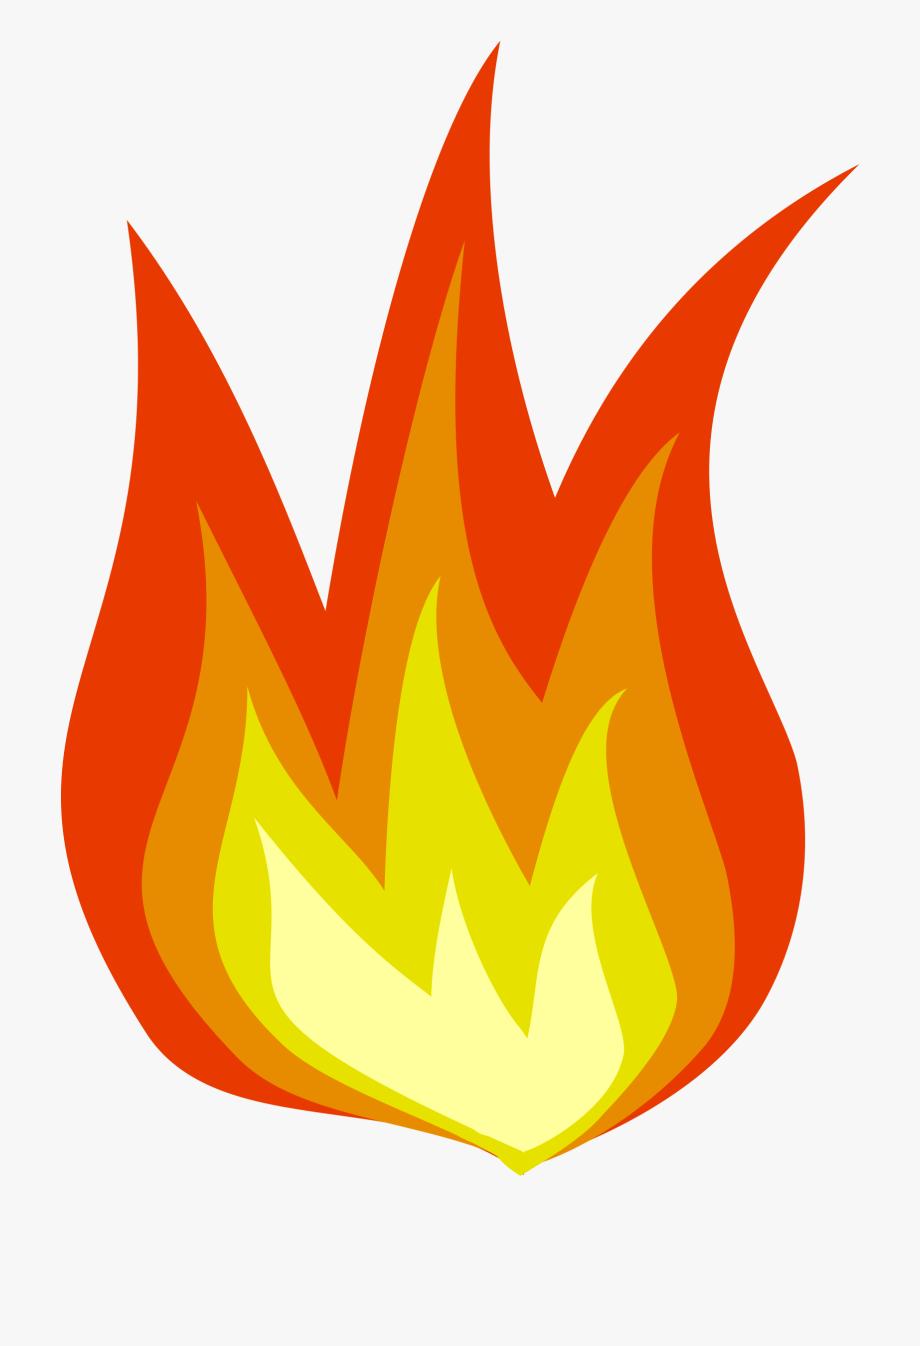 Fire Clipart Transparent Background #4514.